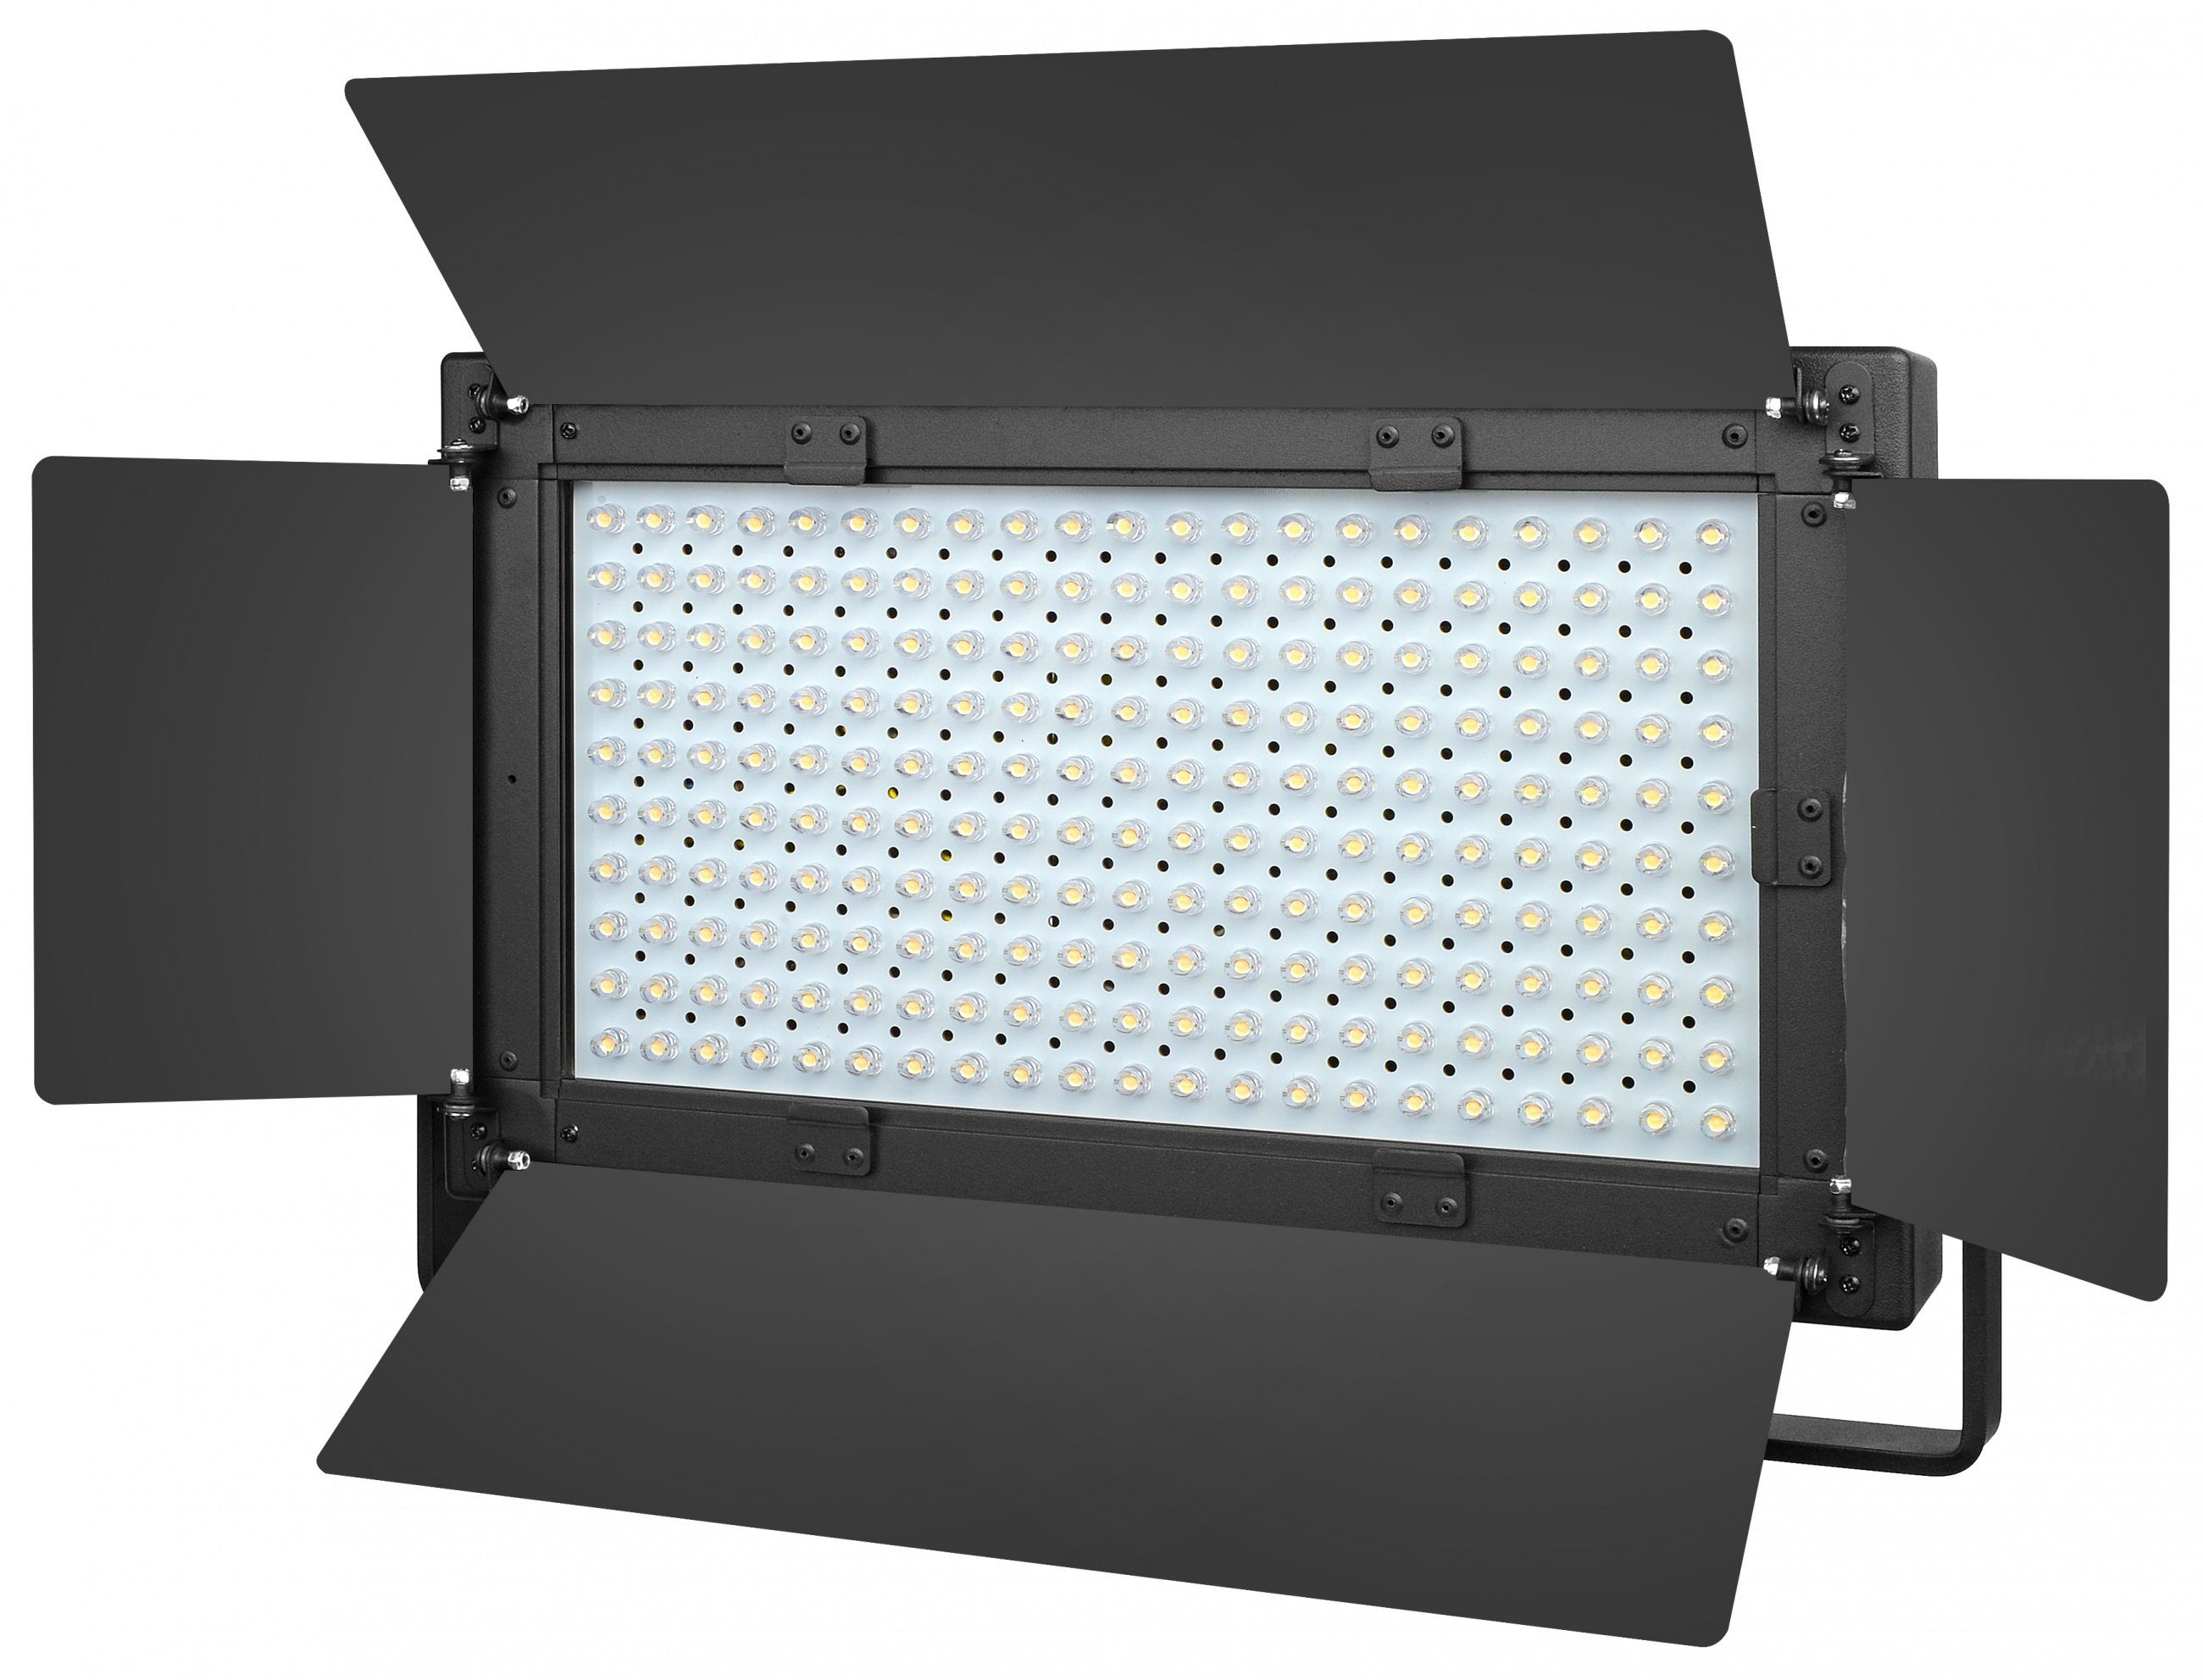 Bresser Fotostudio »LG-1050 LED Flächenleuchte 105W/8.000LUX«